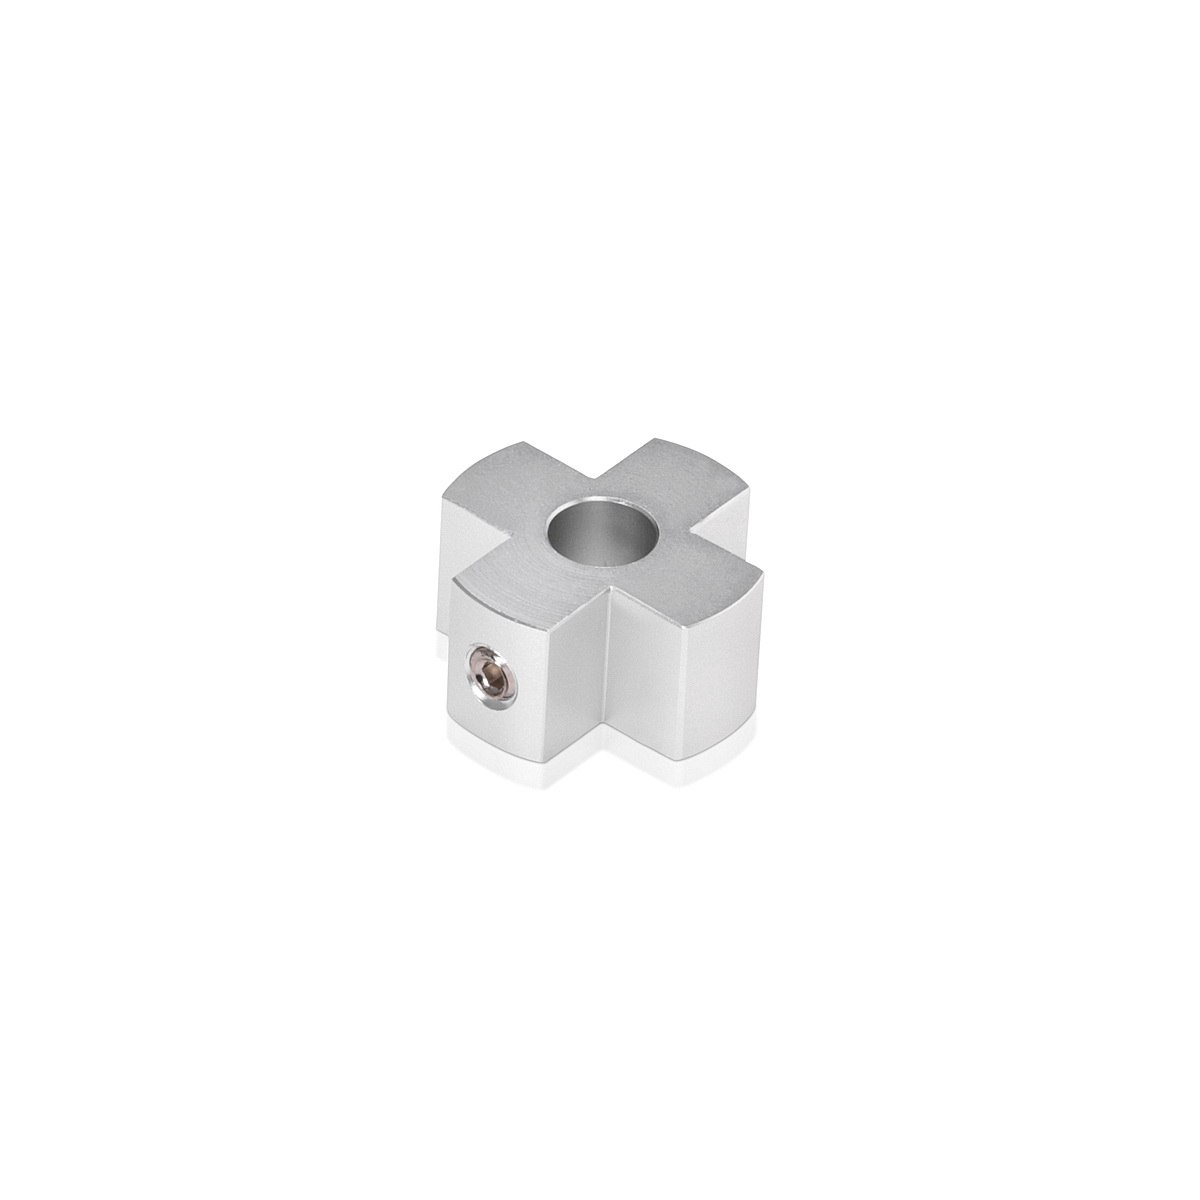 4-Way Standoffs Hub, Diameter: 1'', Thickness: 1/2'', Clear Anodized Aluminum